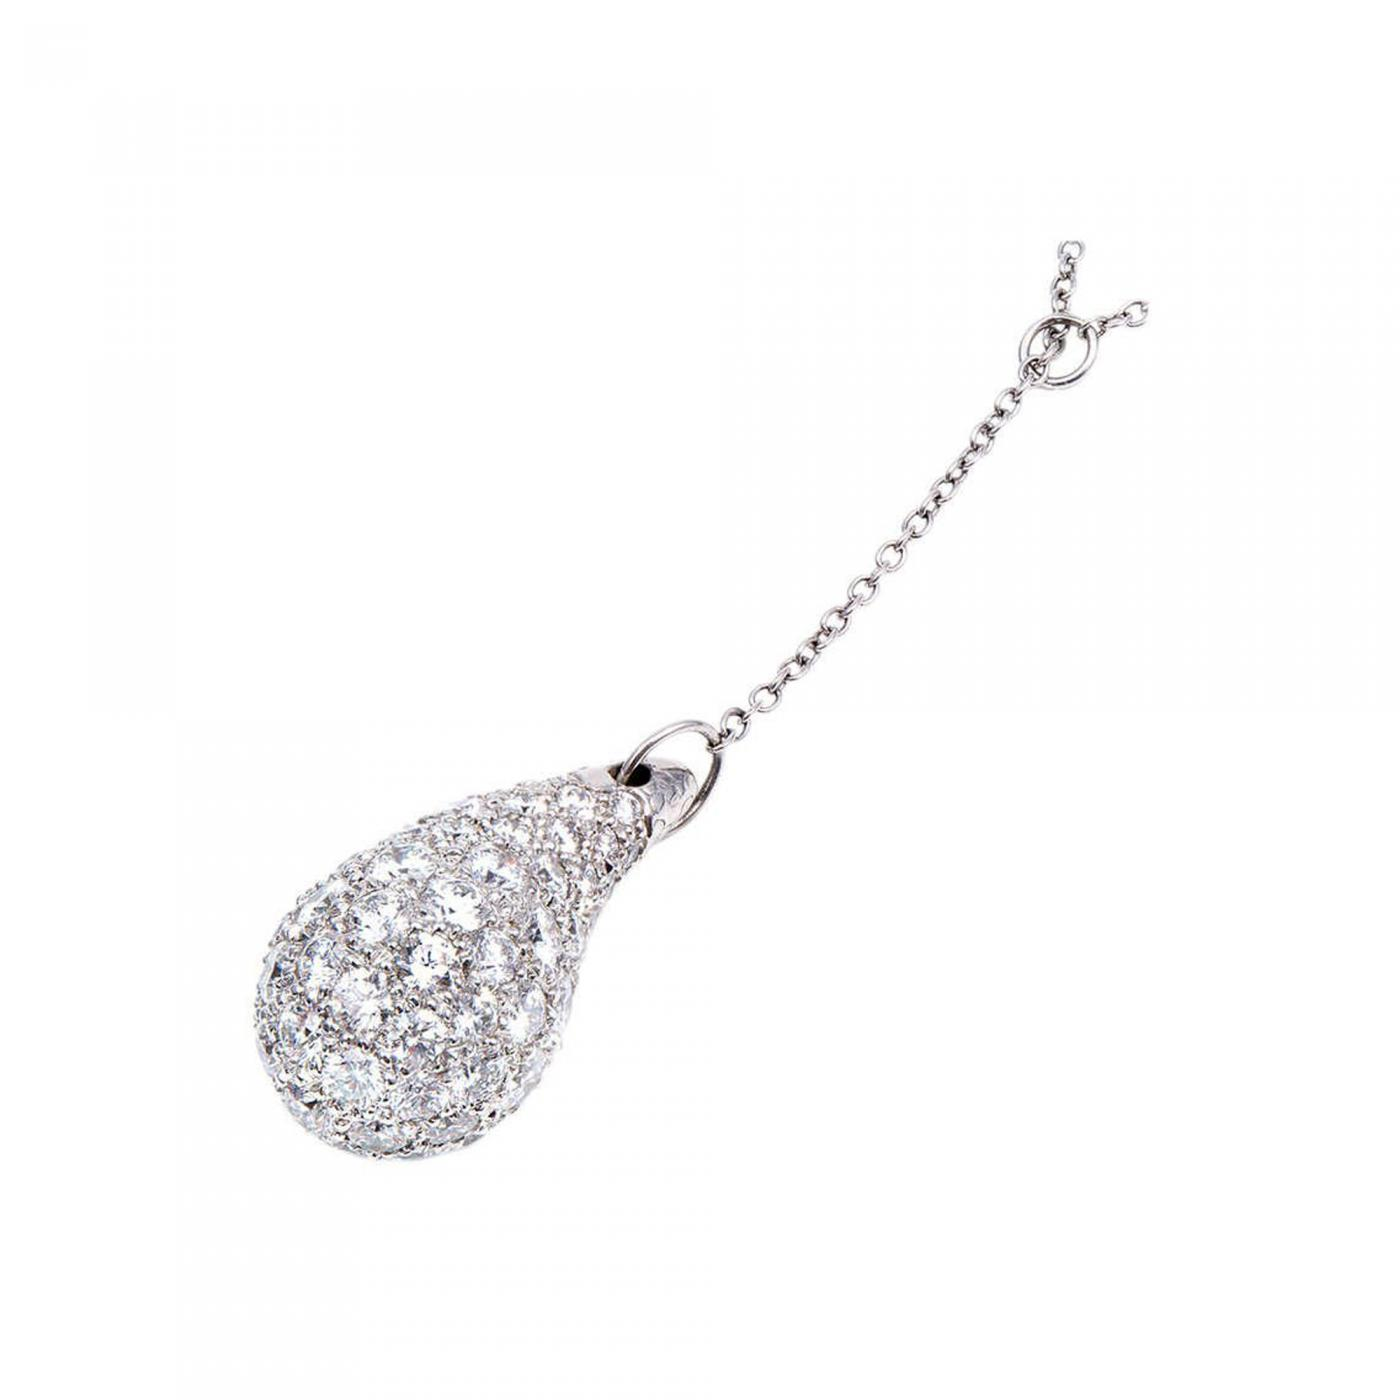 b646d07a5 Tiffany and Co. - Tiffany & Co. Elsa Peretti Teardrop Diamond Pendant ...